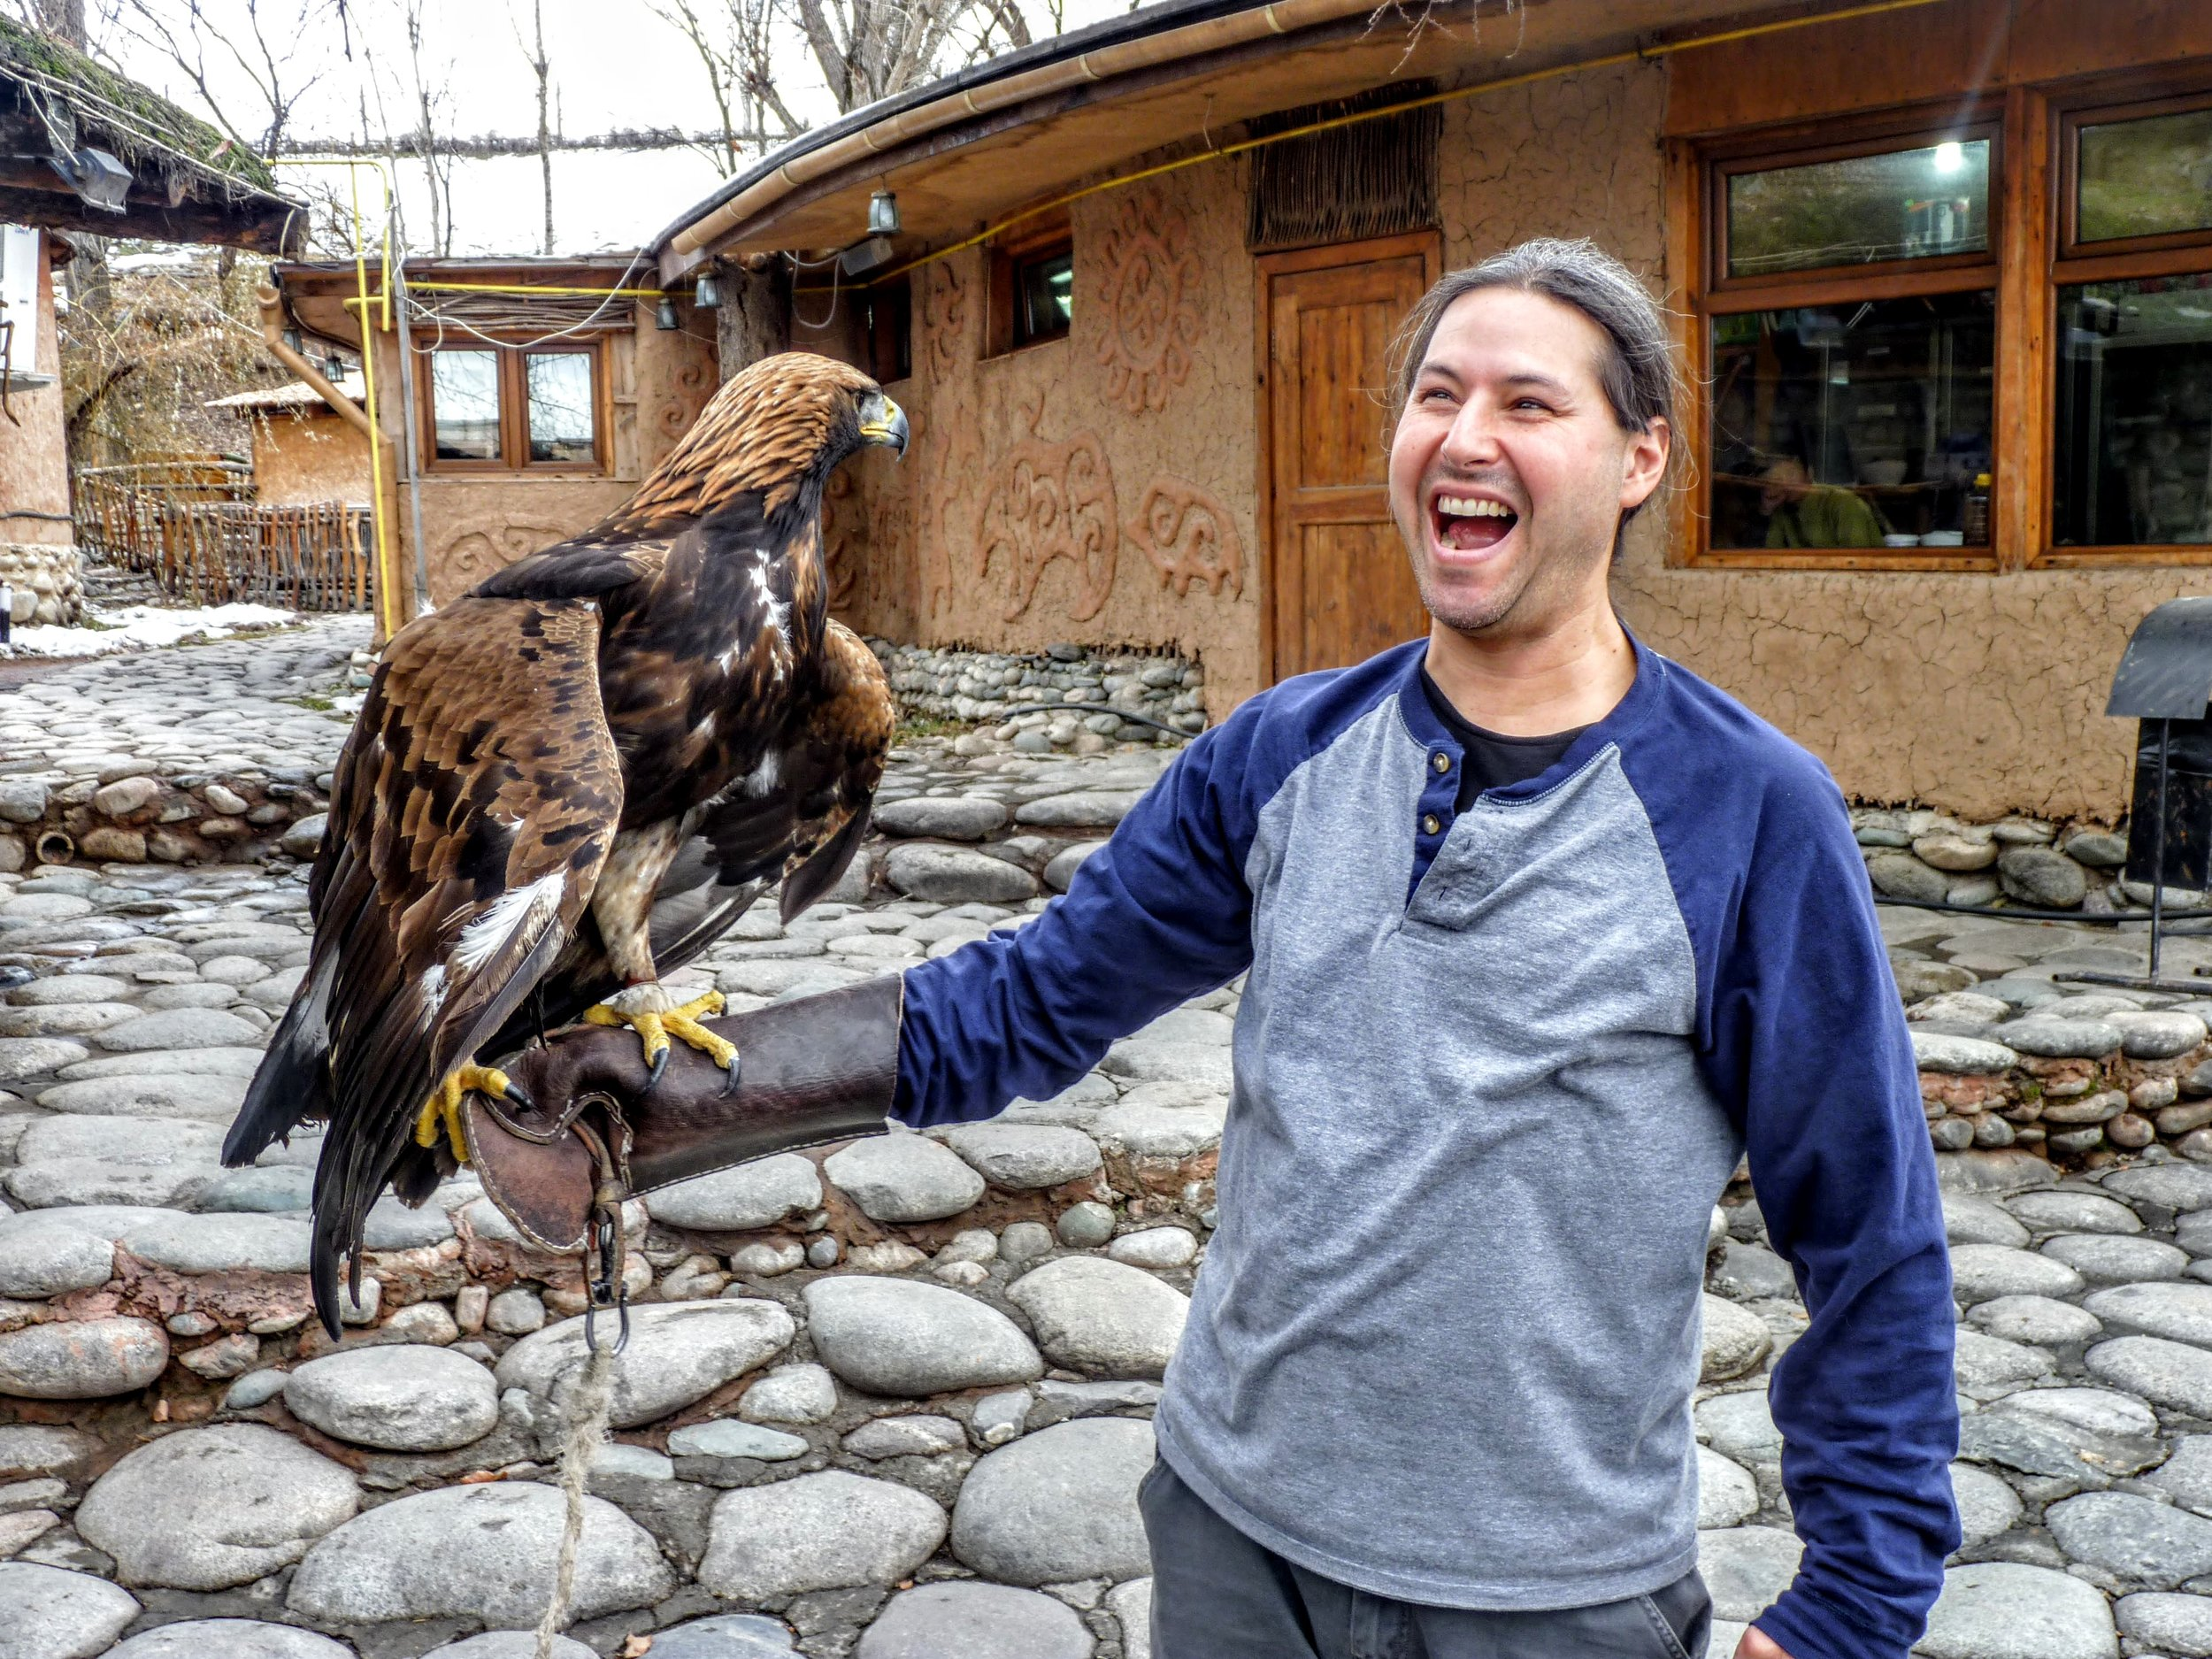 Jon's new feathered friend.